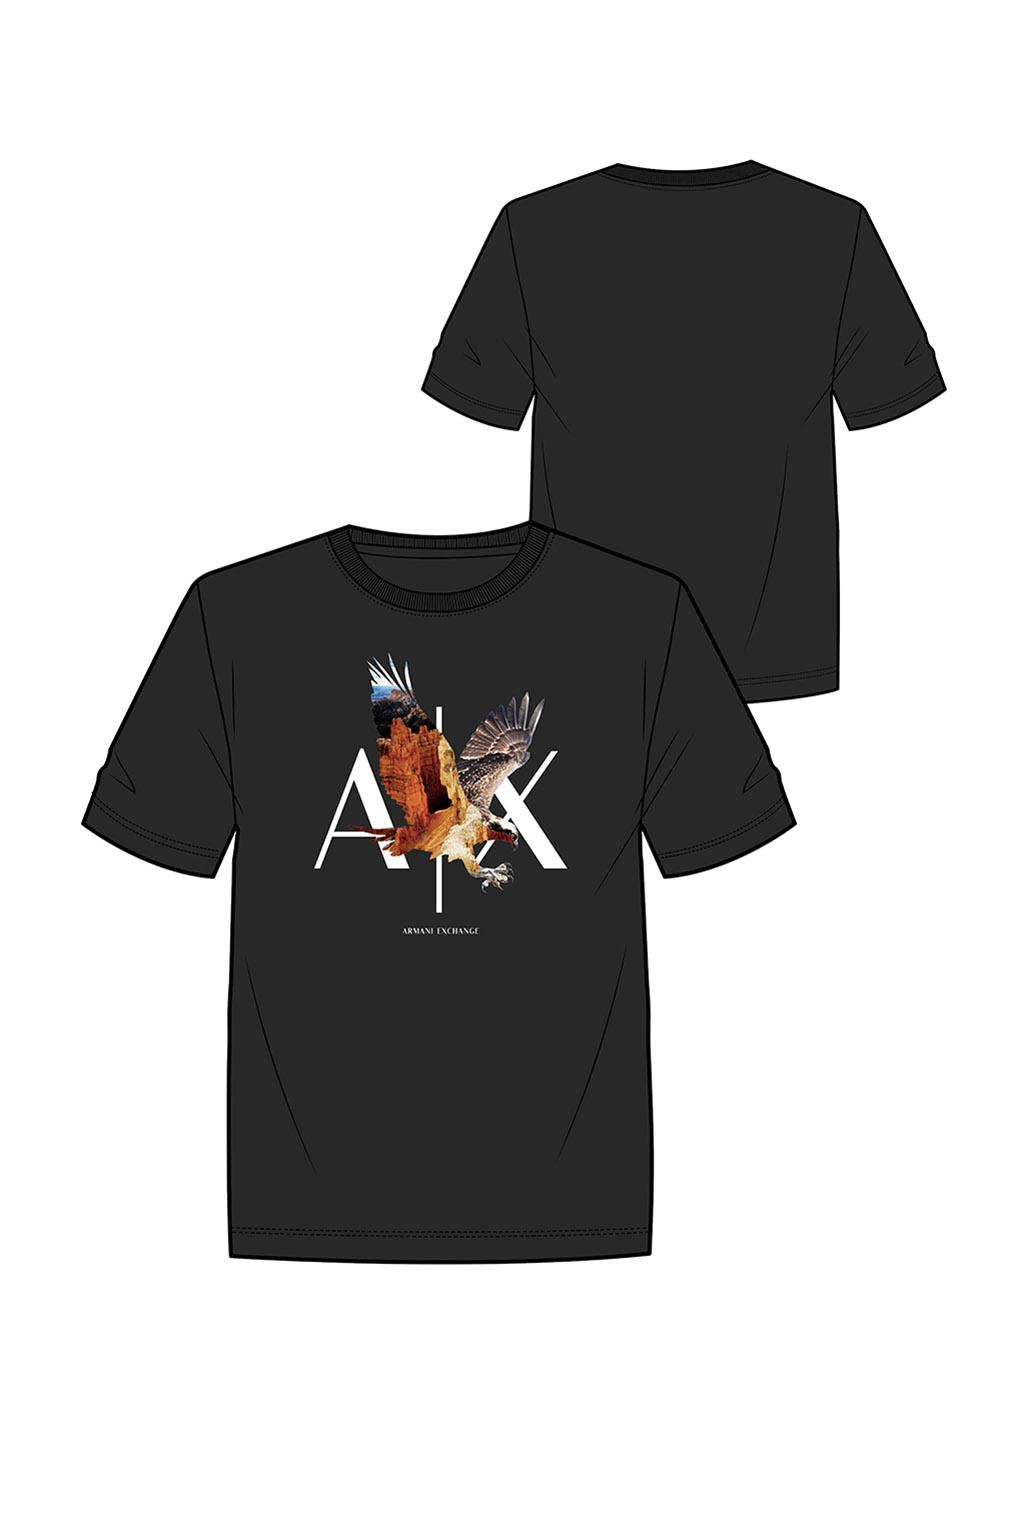 T-shirt uomo ARMANI EXCHANGE stampa con acquila